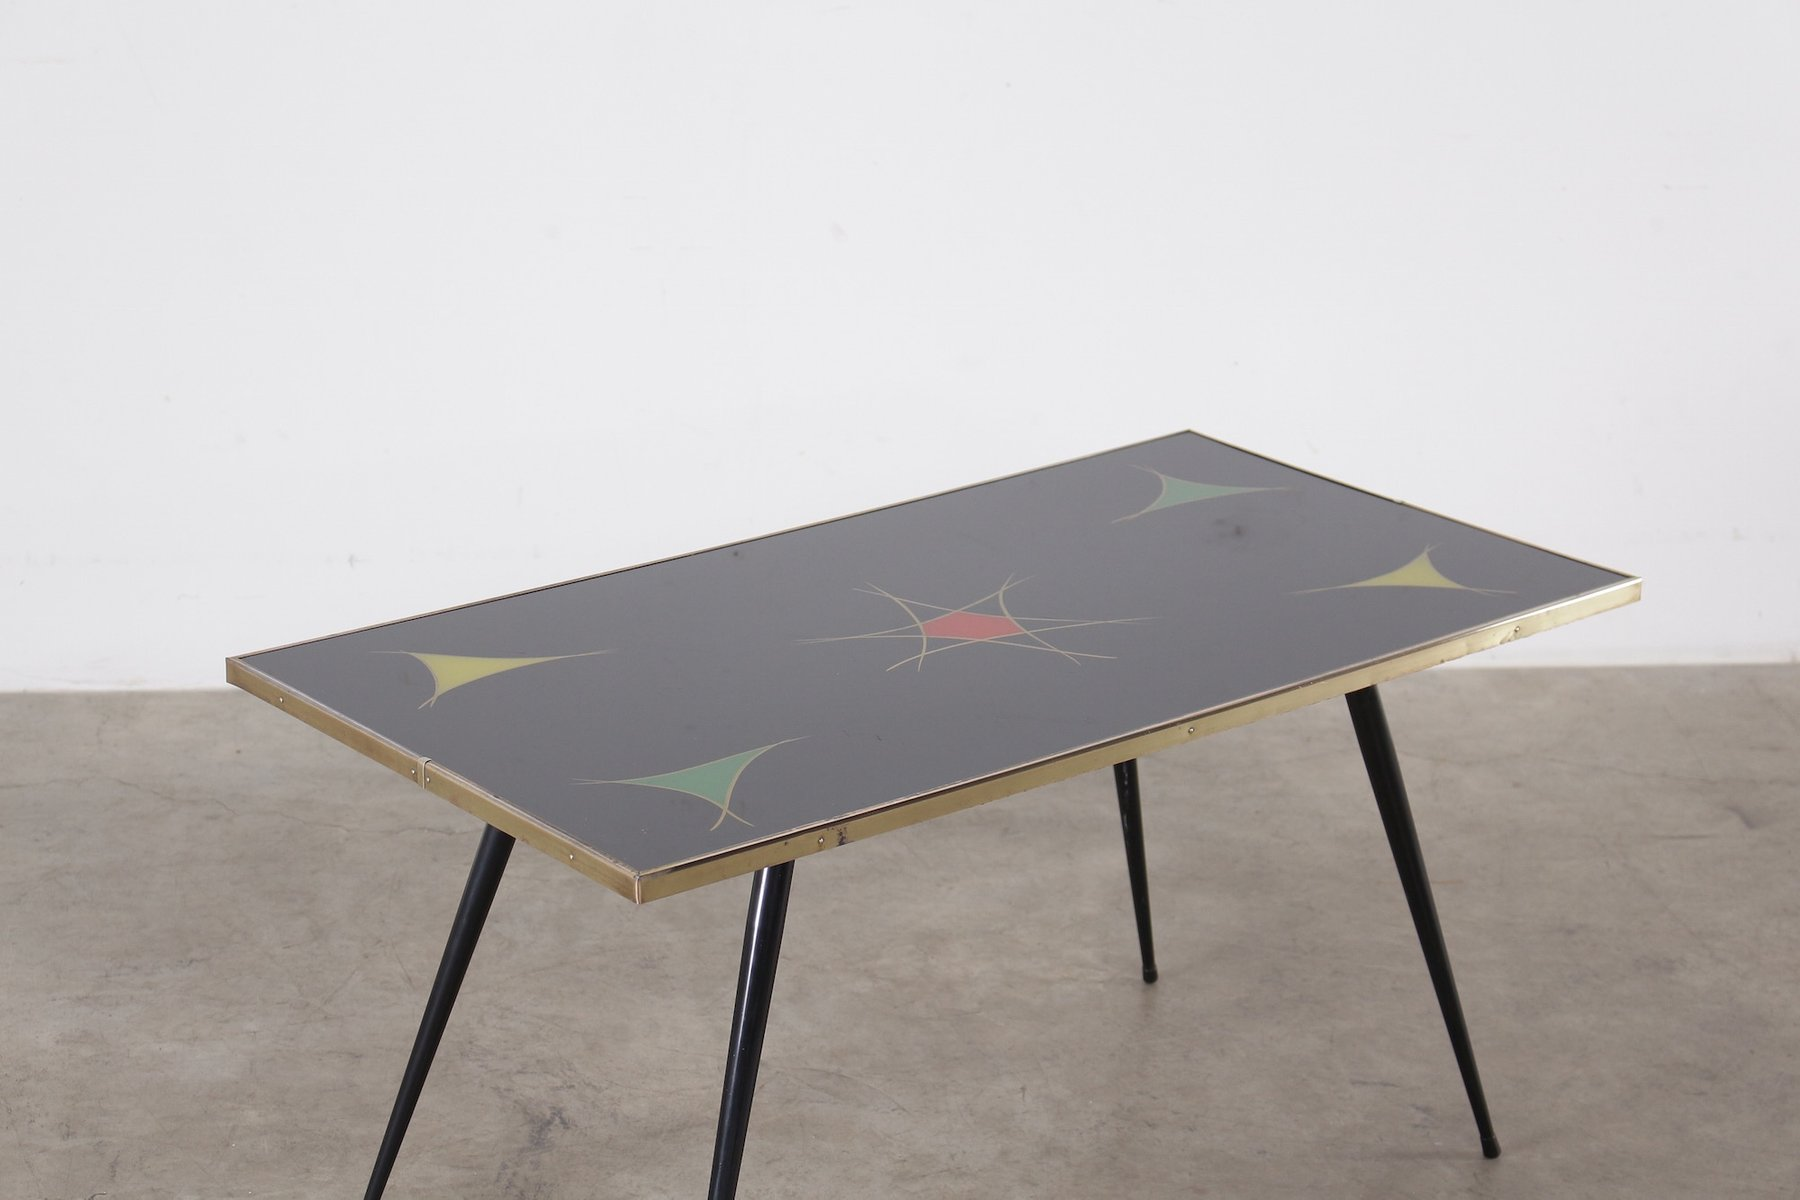 table basse vintage en verre noir en vente sur pamono. Black Bedroom Furniture Sets. Home Design Ideas